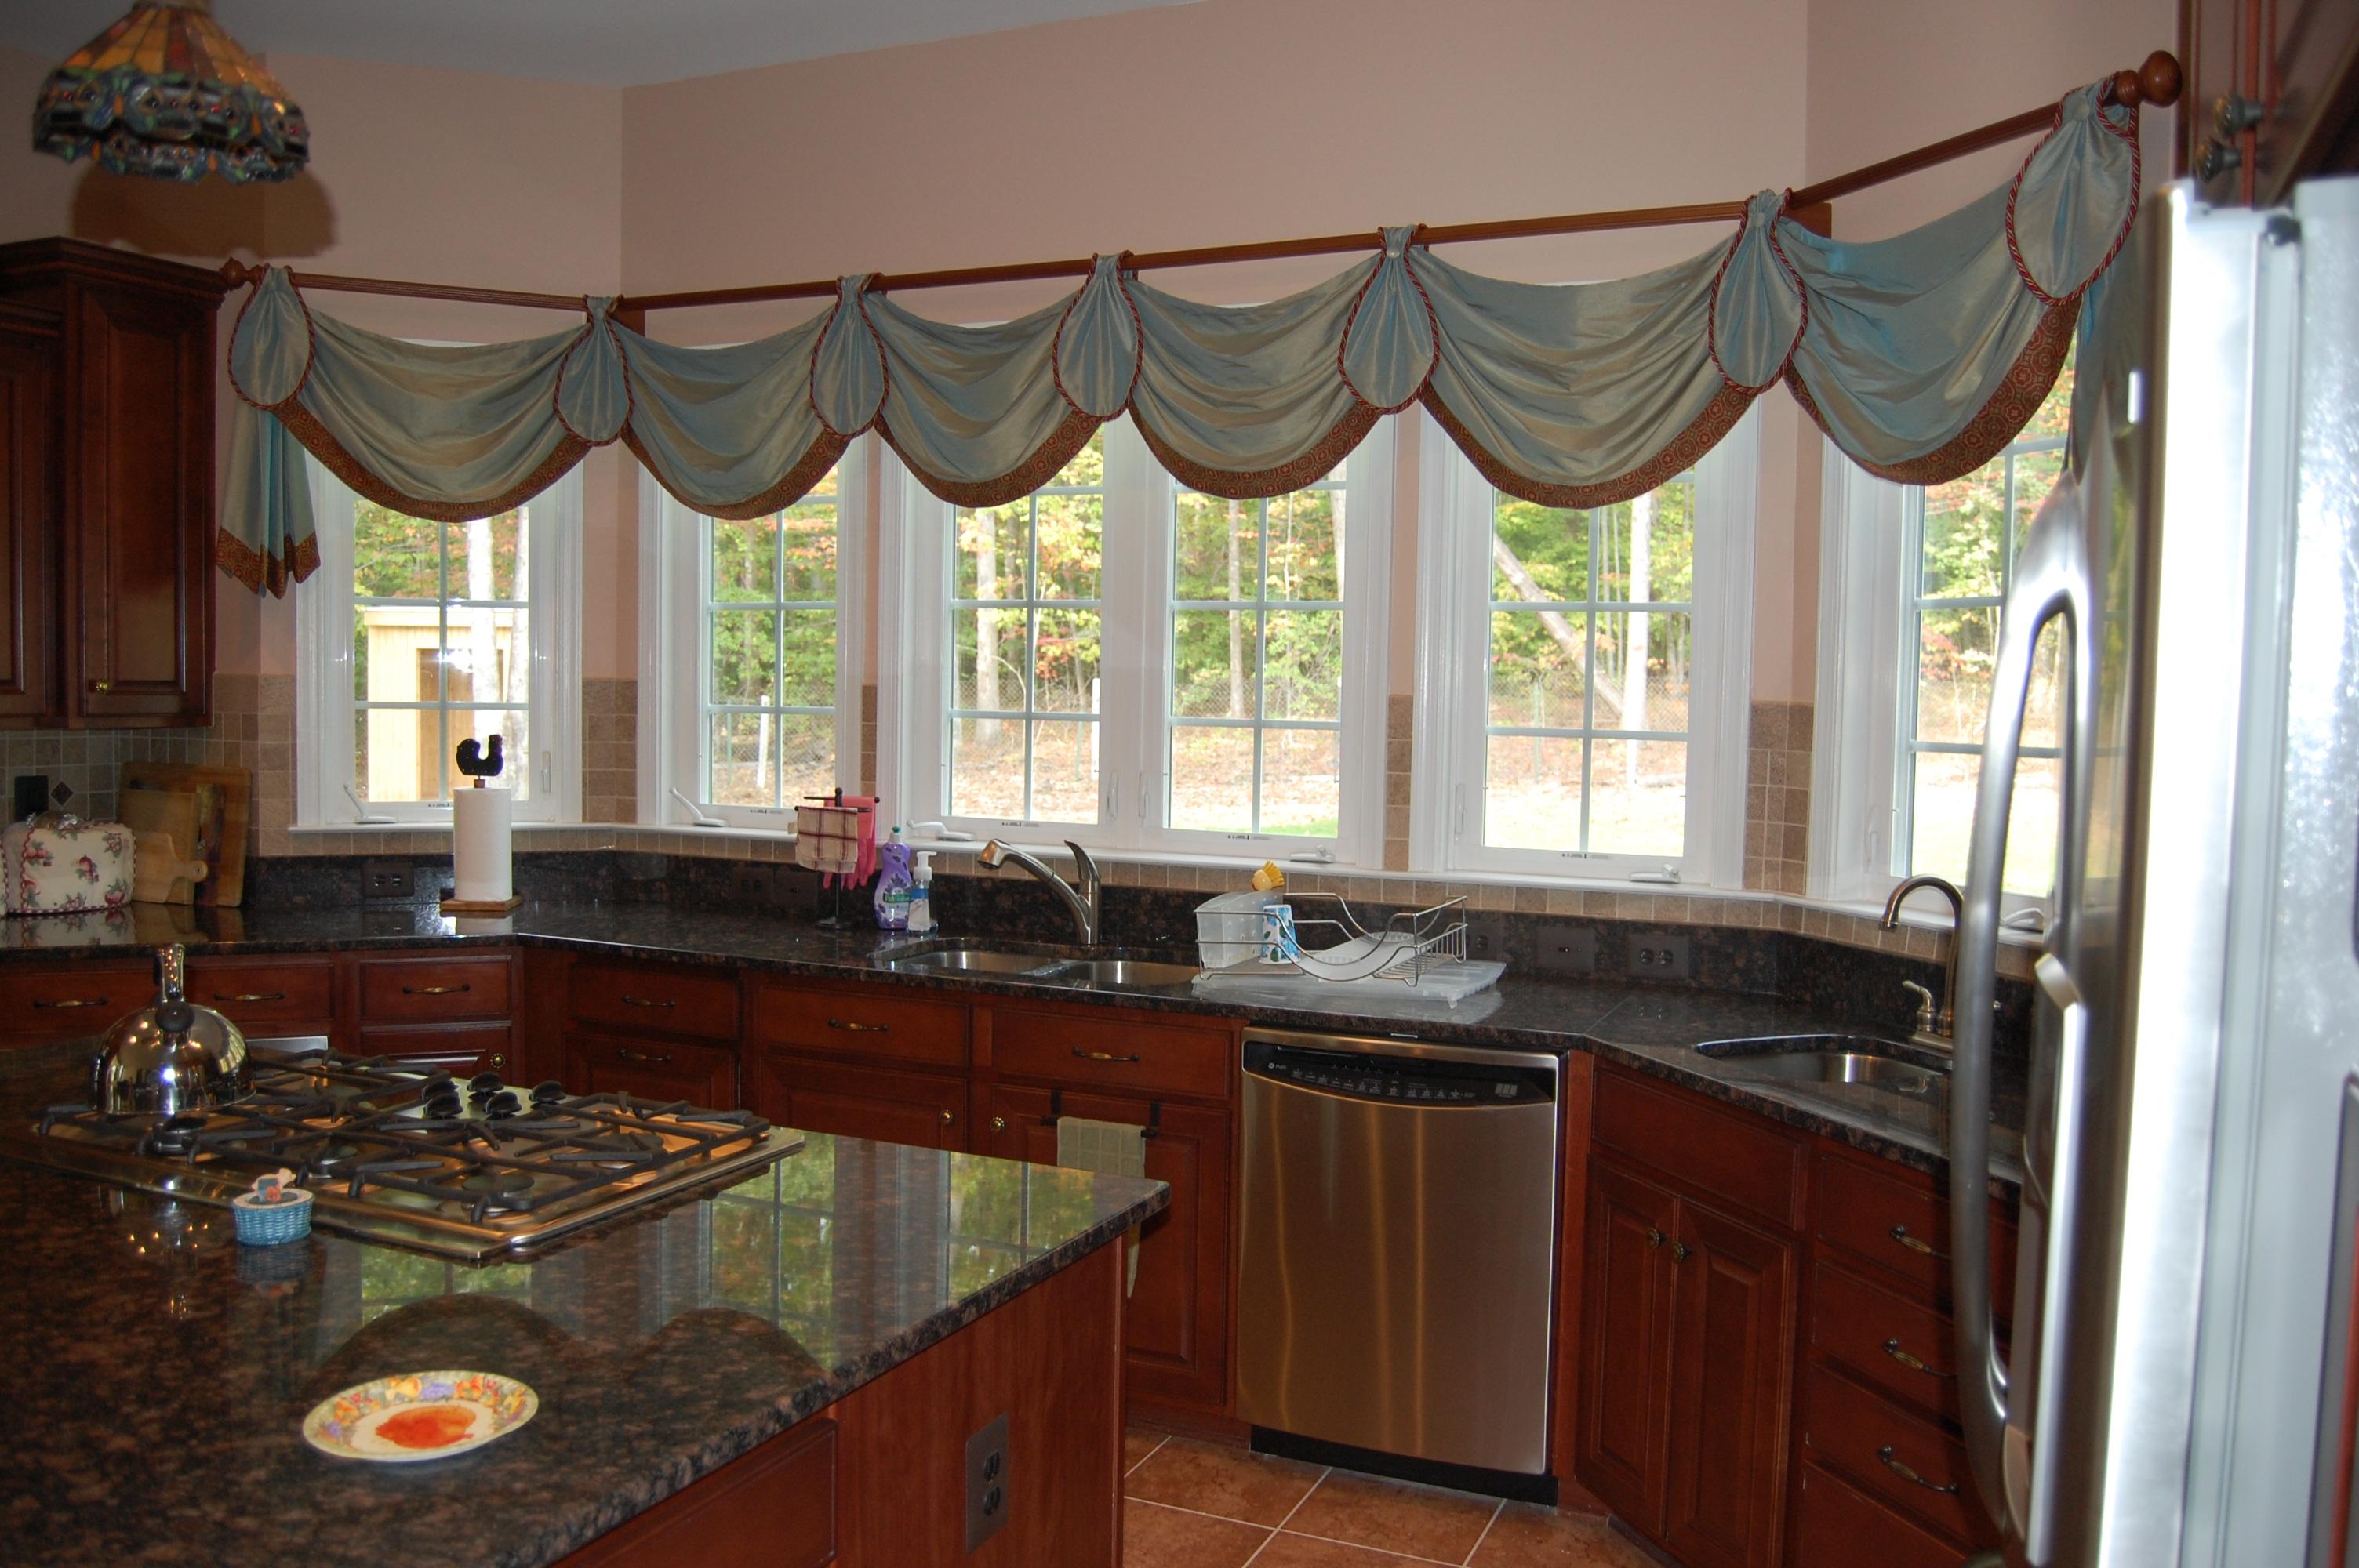 Curtain for kitchen window